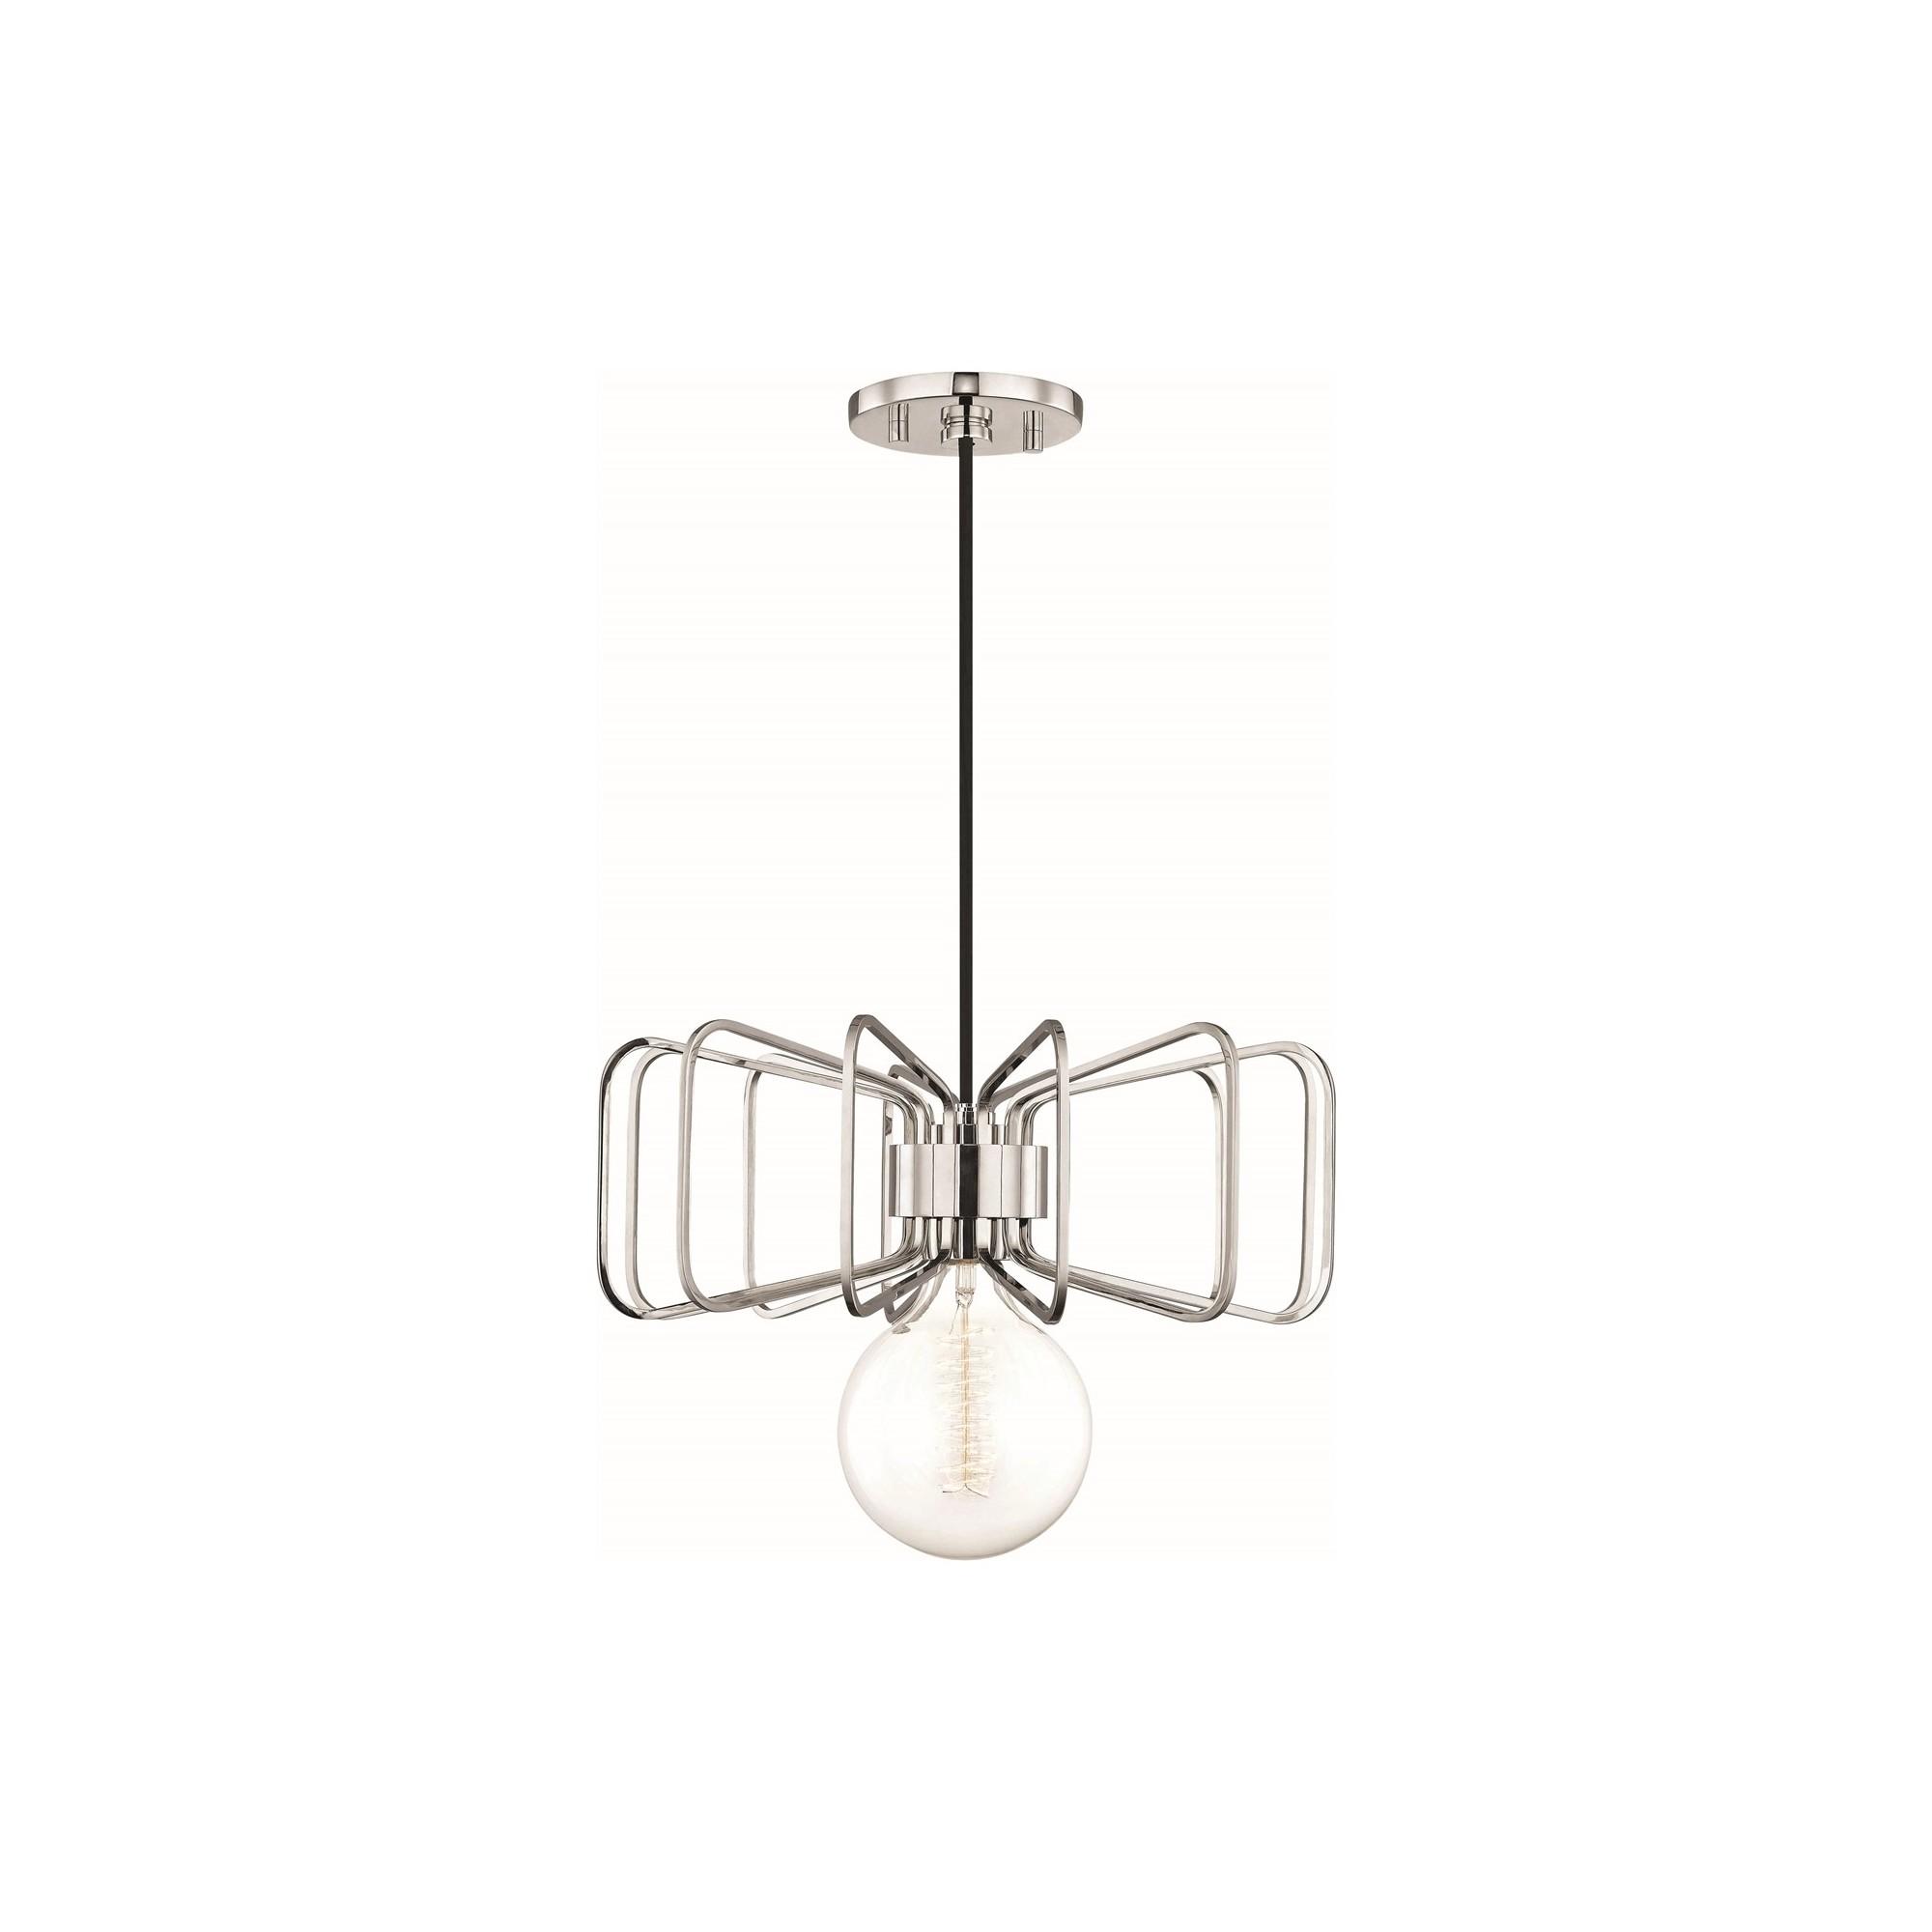 1pc Daisy Light Pendant Brushed Nickel - Mitzi by Hudson Valley